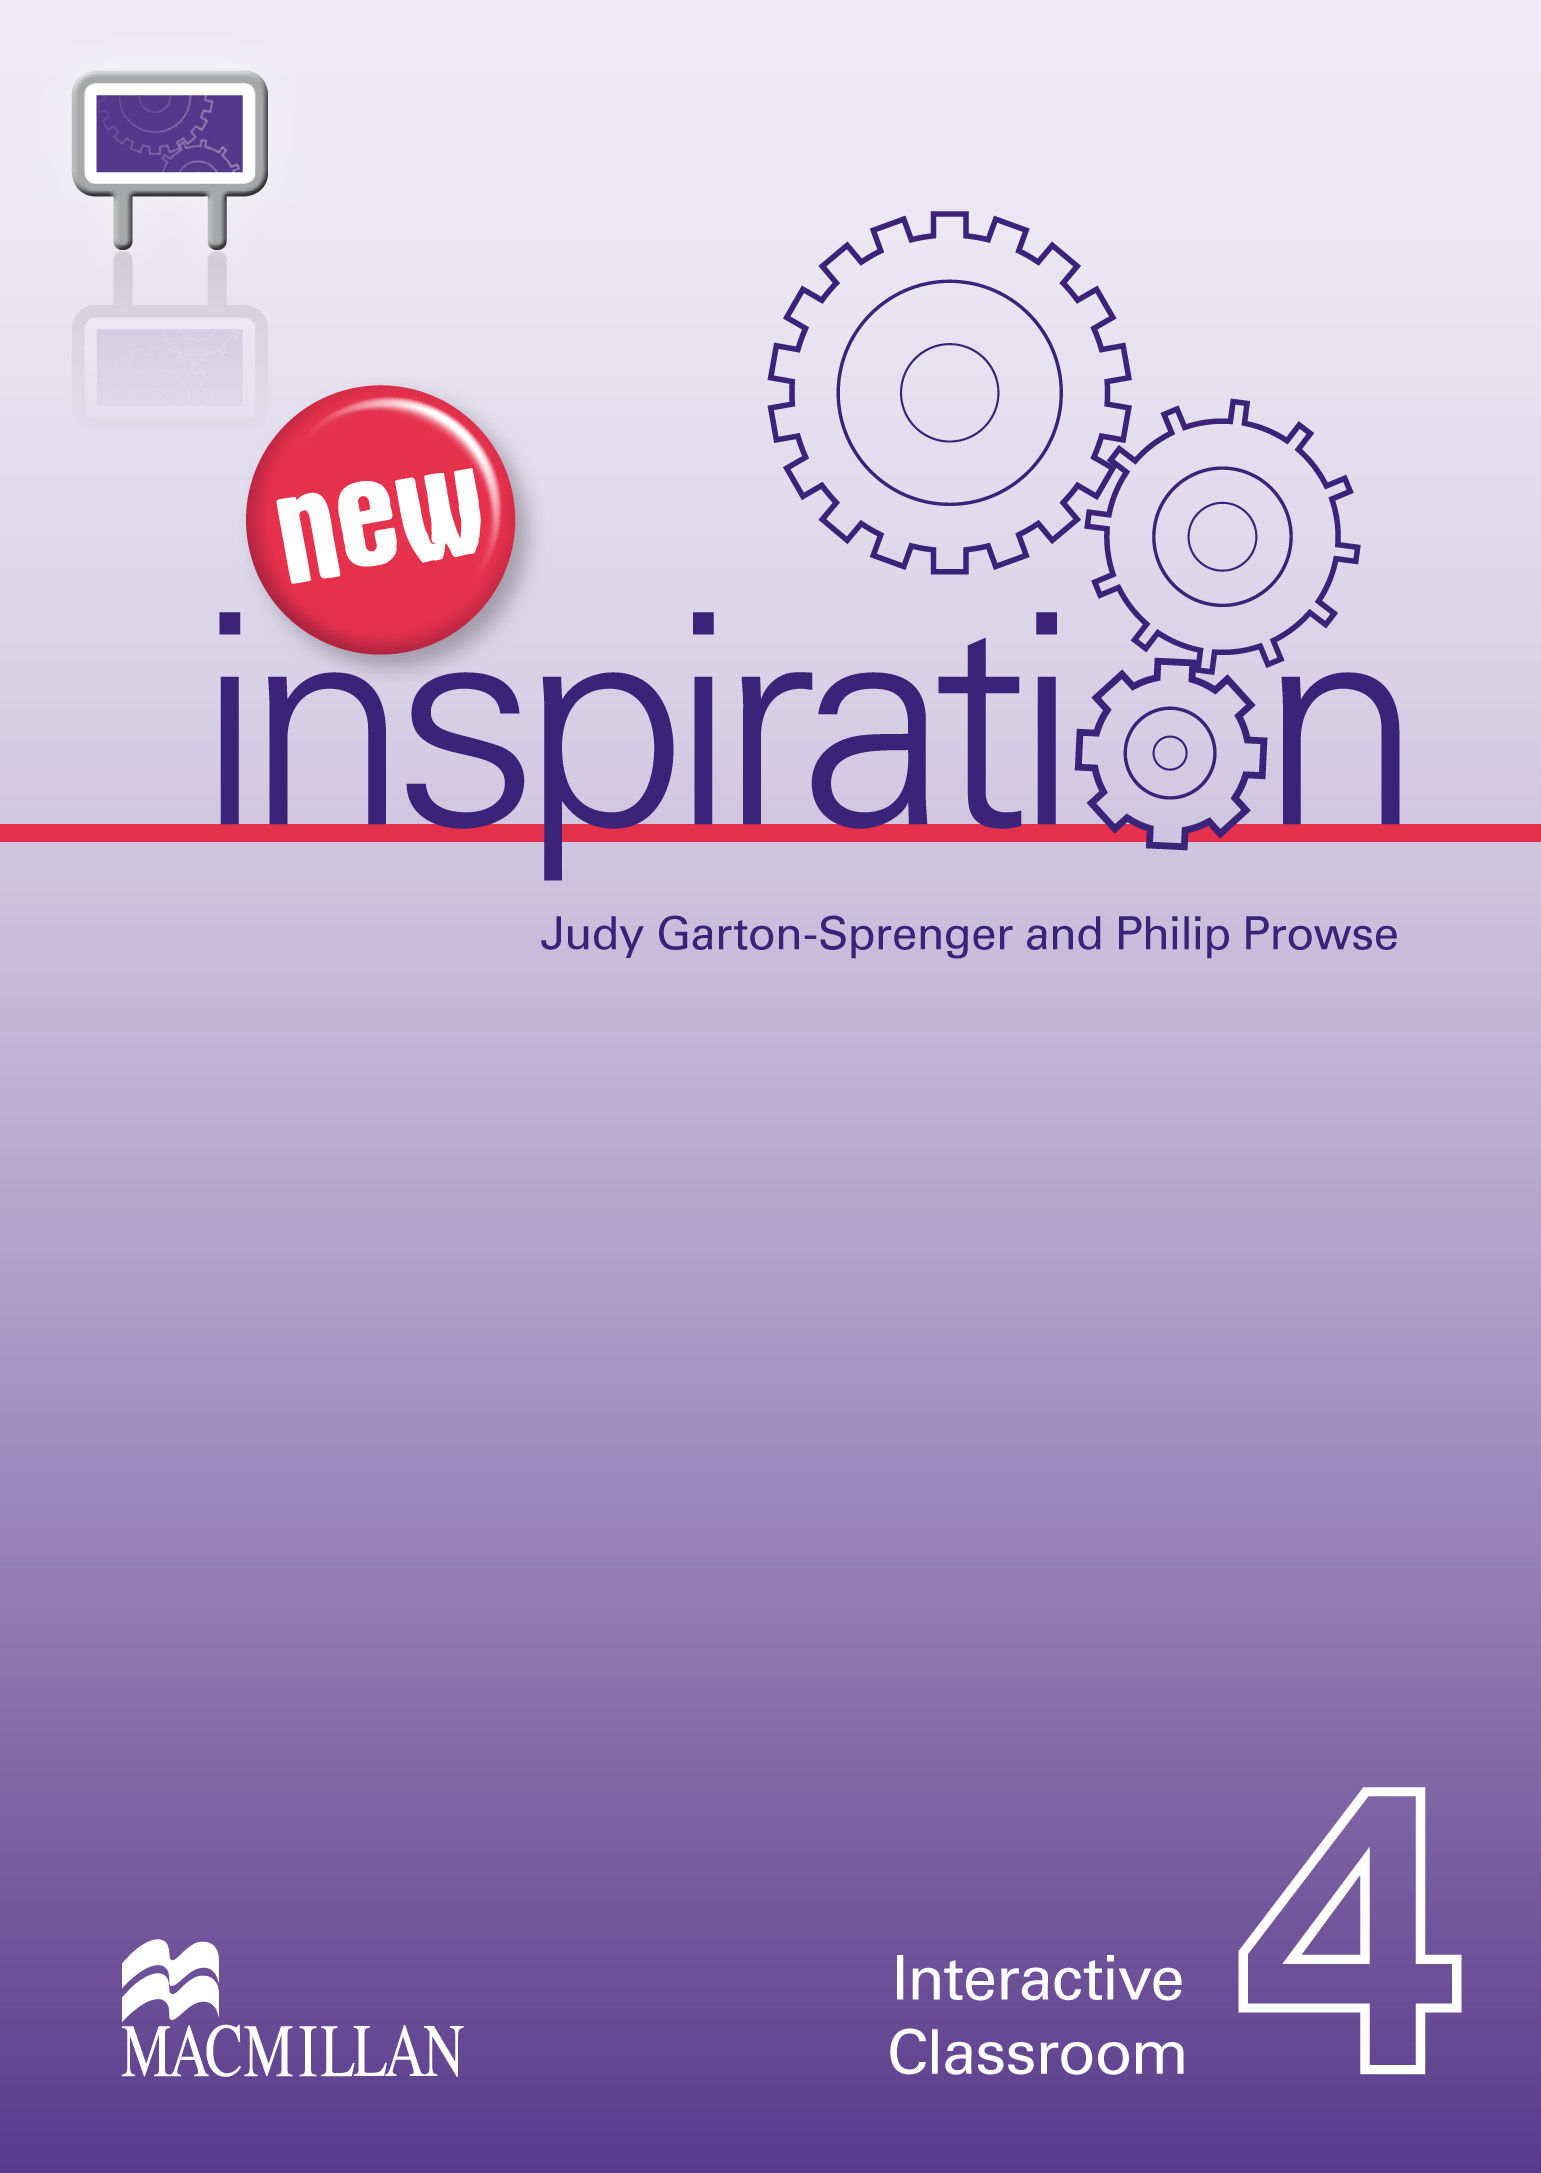 New Inspiration Interactive Classroom 4